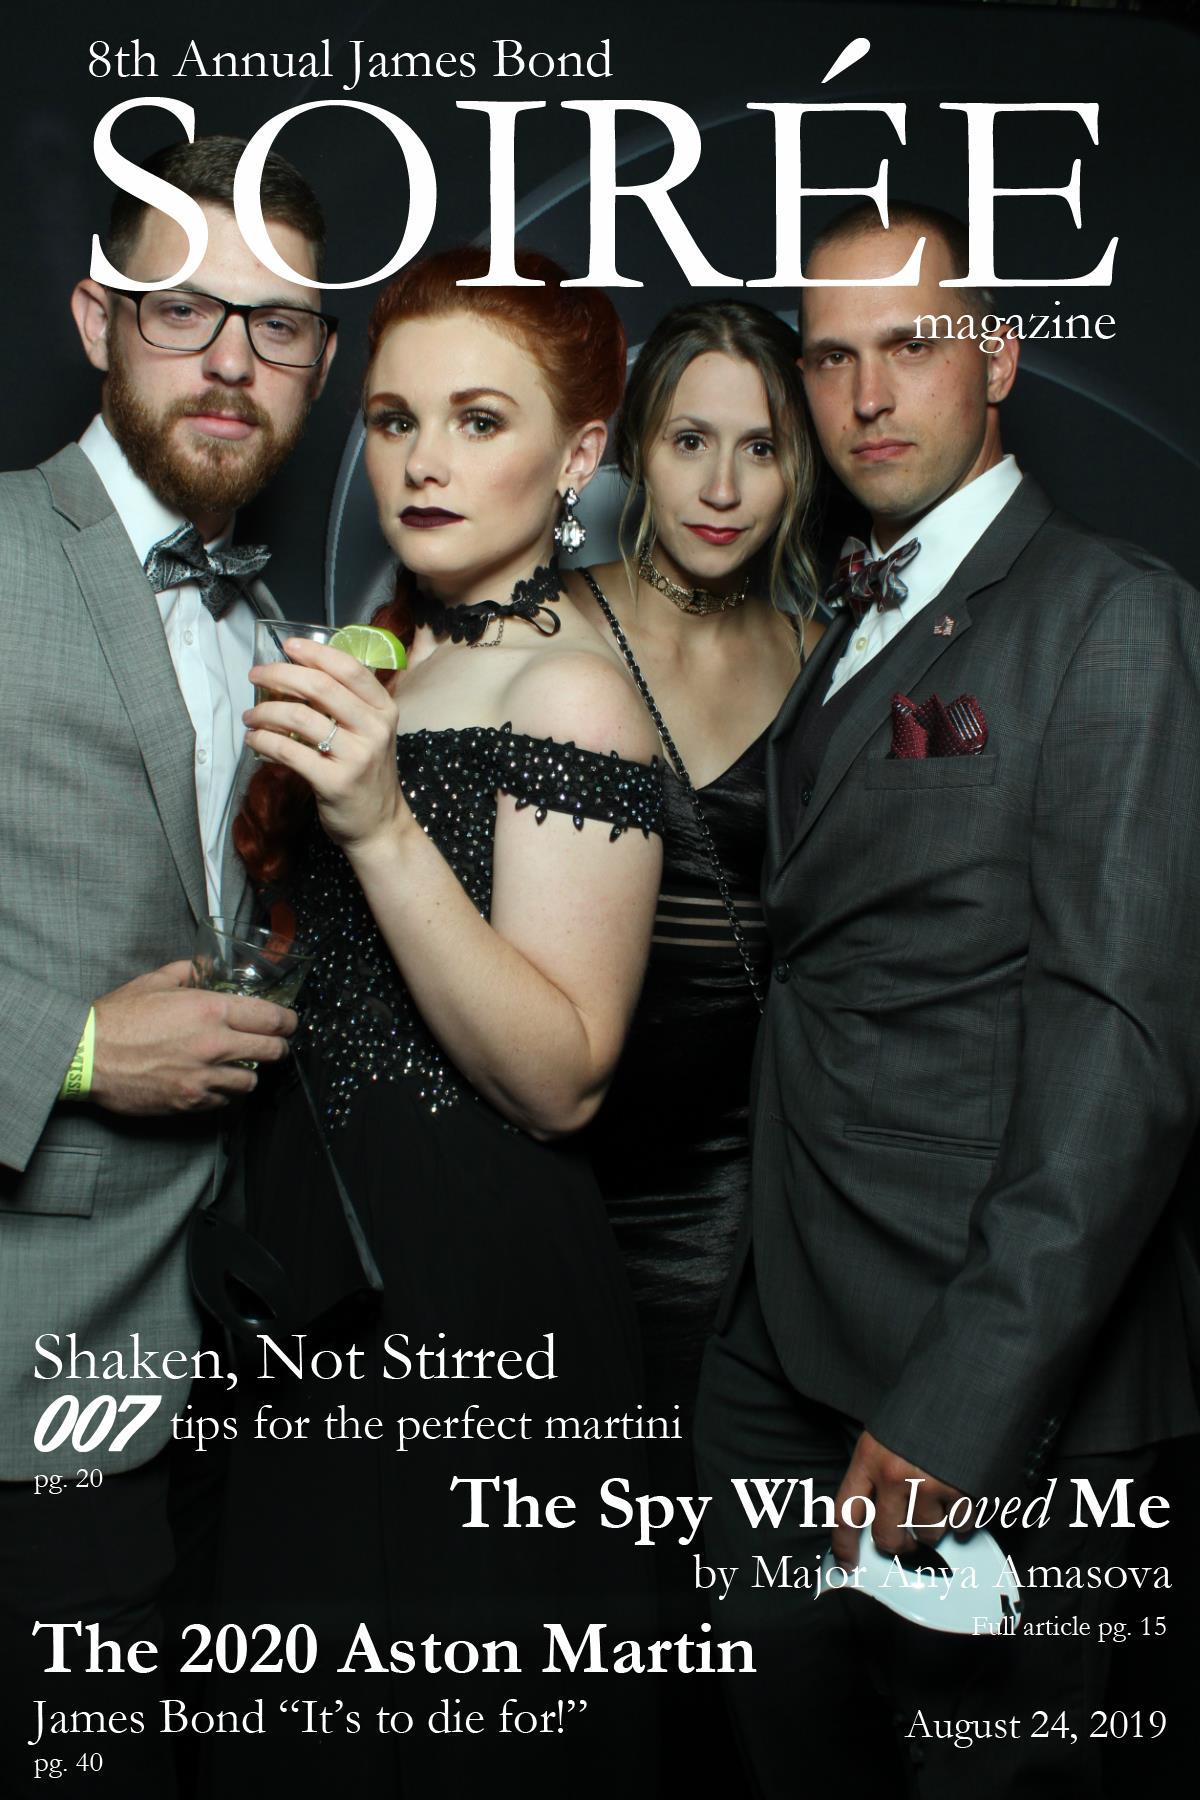 James Bond Soiree, James Bond Theme Casino Night, James Bond Soiree Cake, Cake Night Club